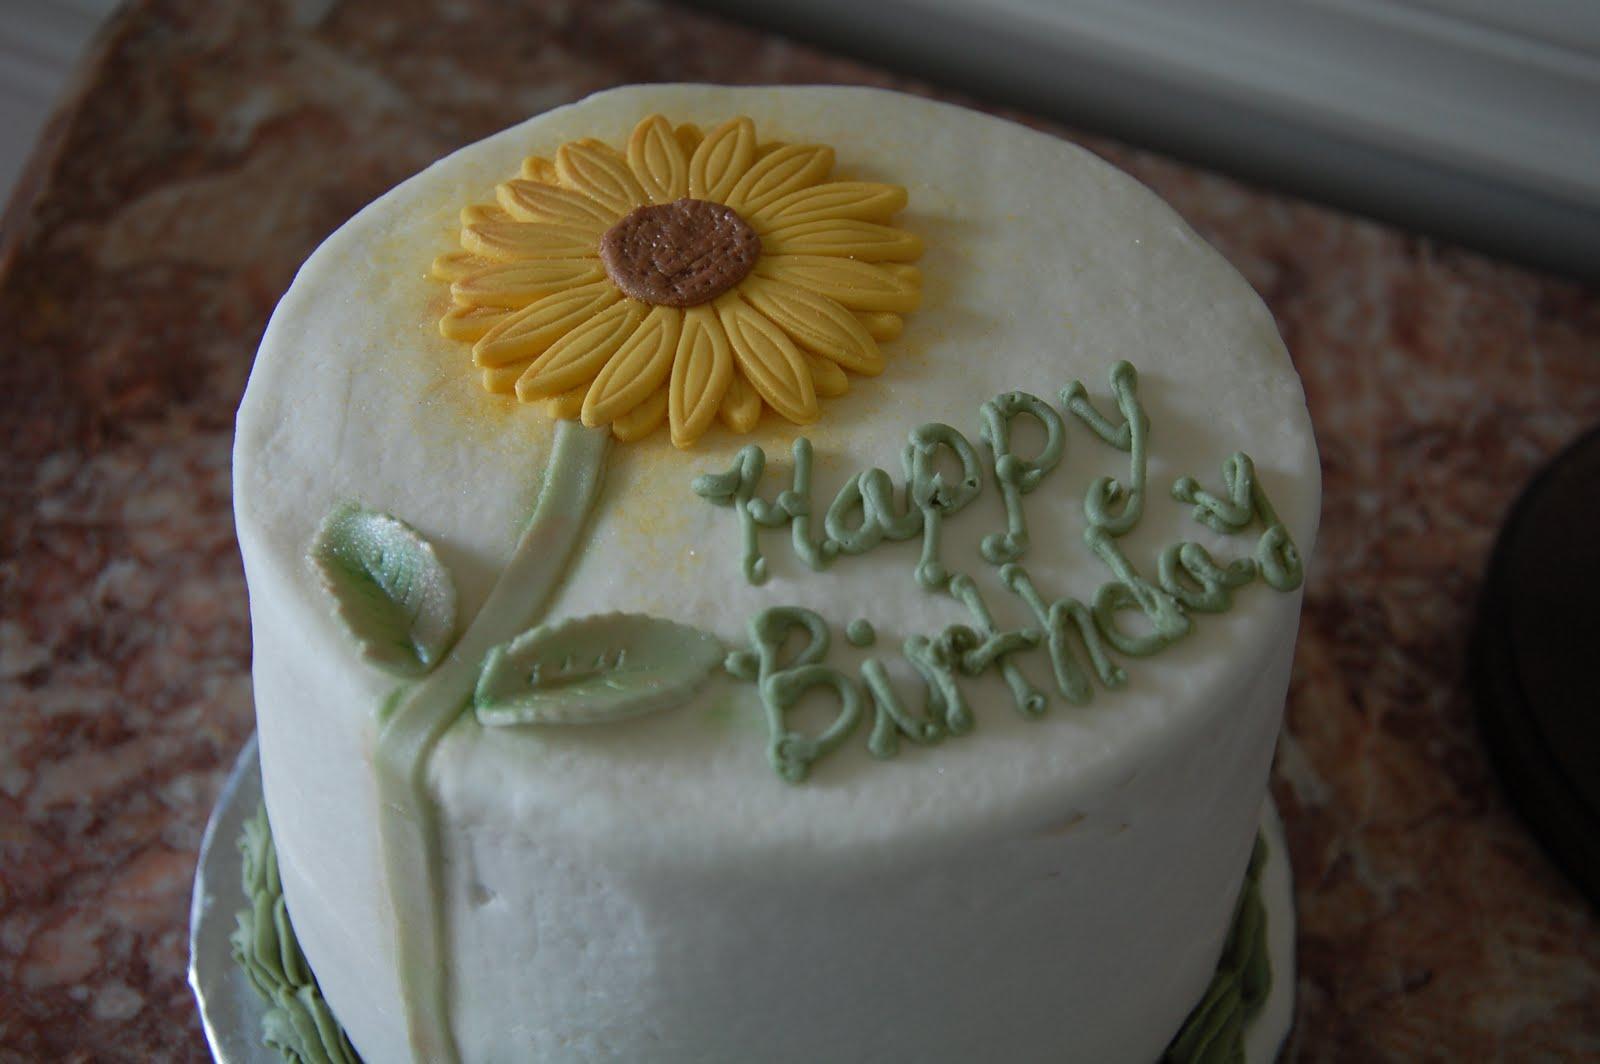 Angela Bartons Cakes: Happy Birthday!